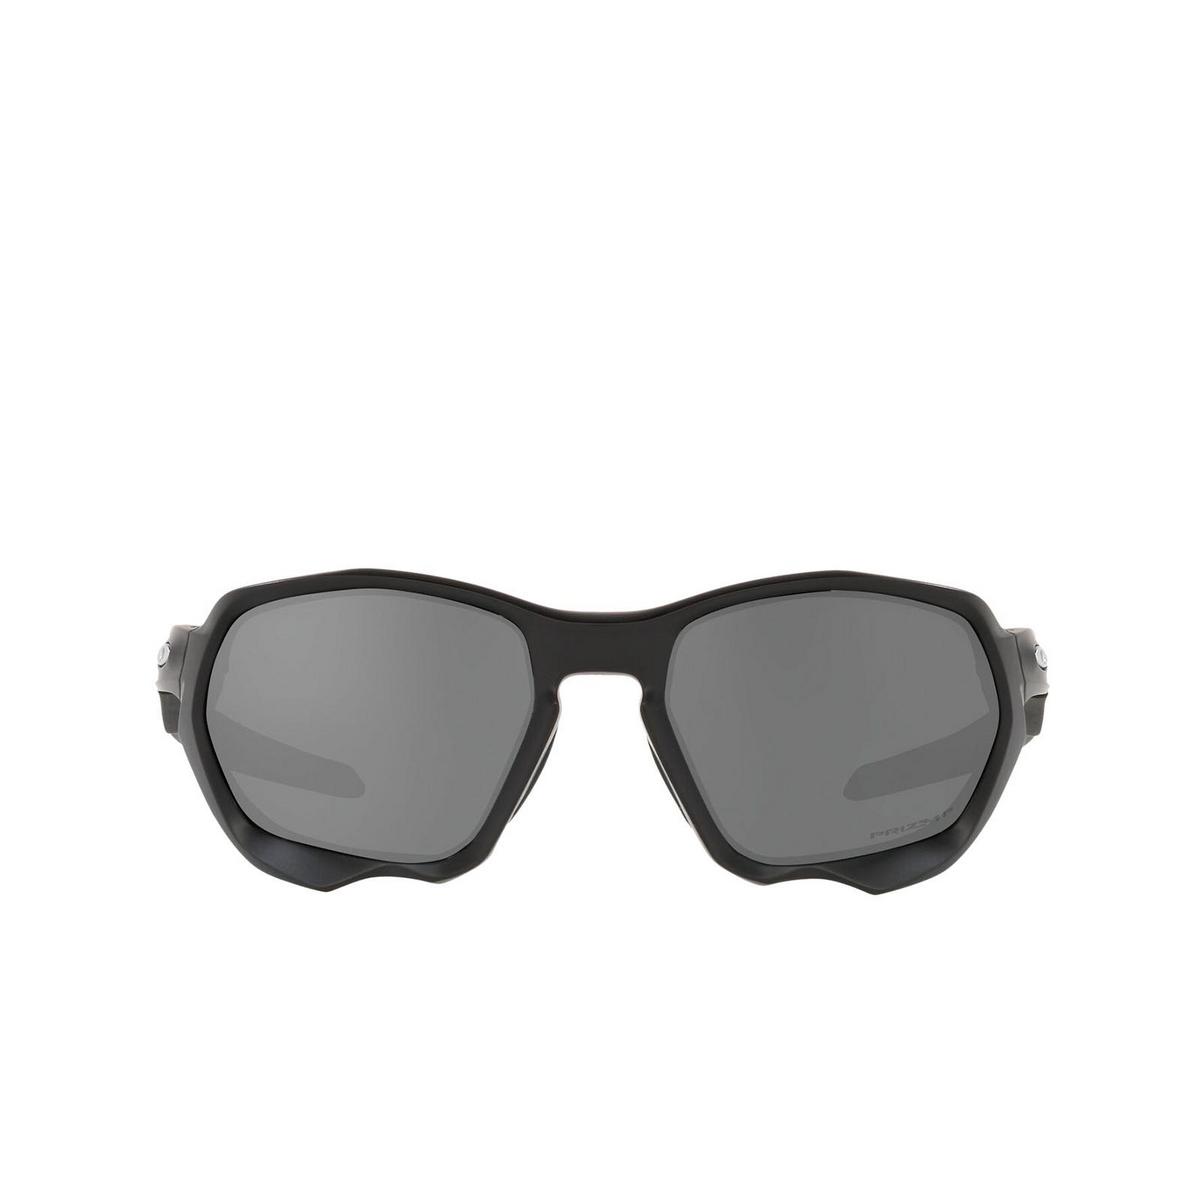 Oakley® Sport Sunglasses: Plazma OO9019 color Matte Black 901906 - front view.